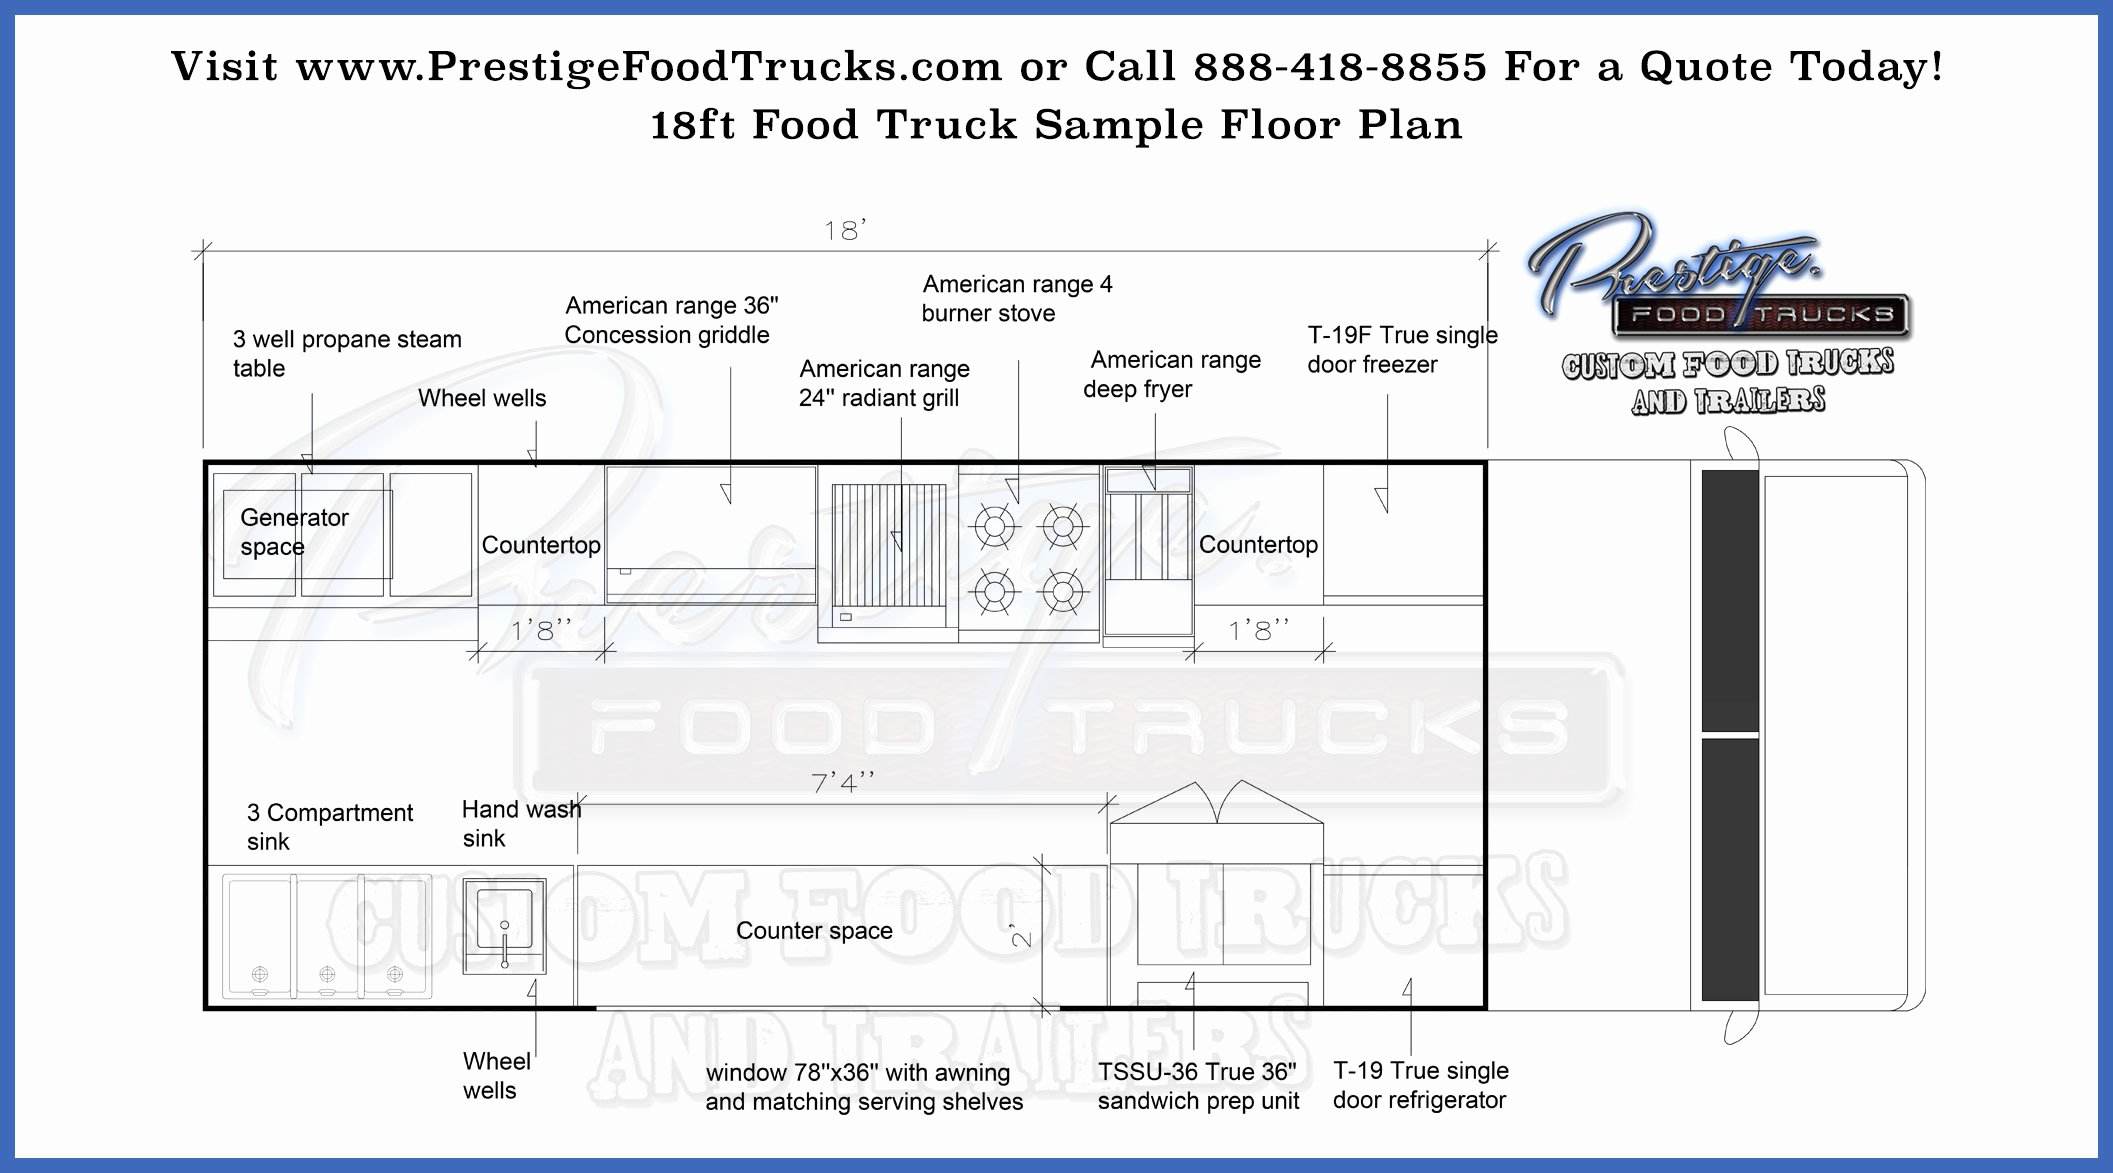 Food Truck Layout Template Unique Custom Food Truck Floor Plan Samples